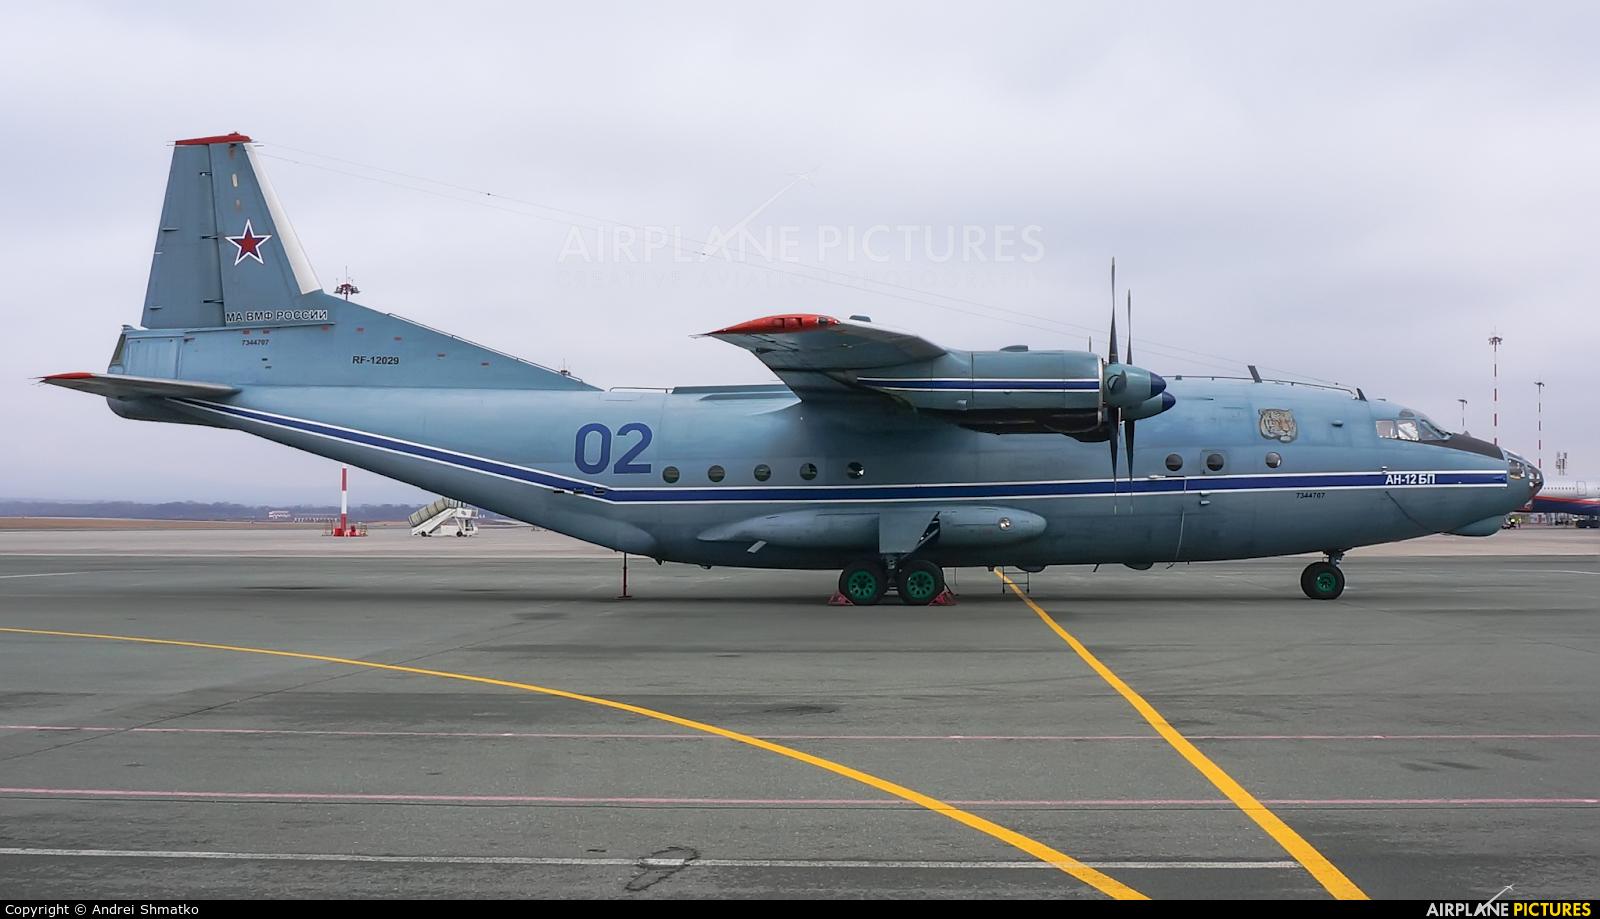 Russia - Navy RF-12029 aircraft at Vladivostok Knevichi